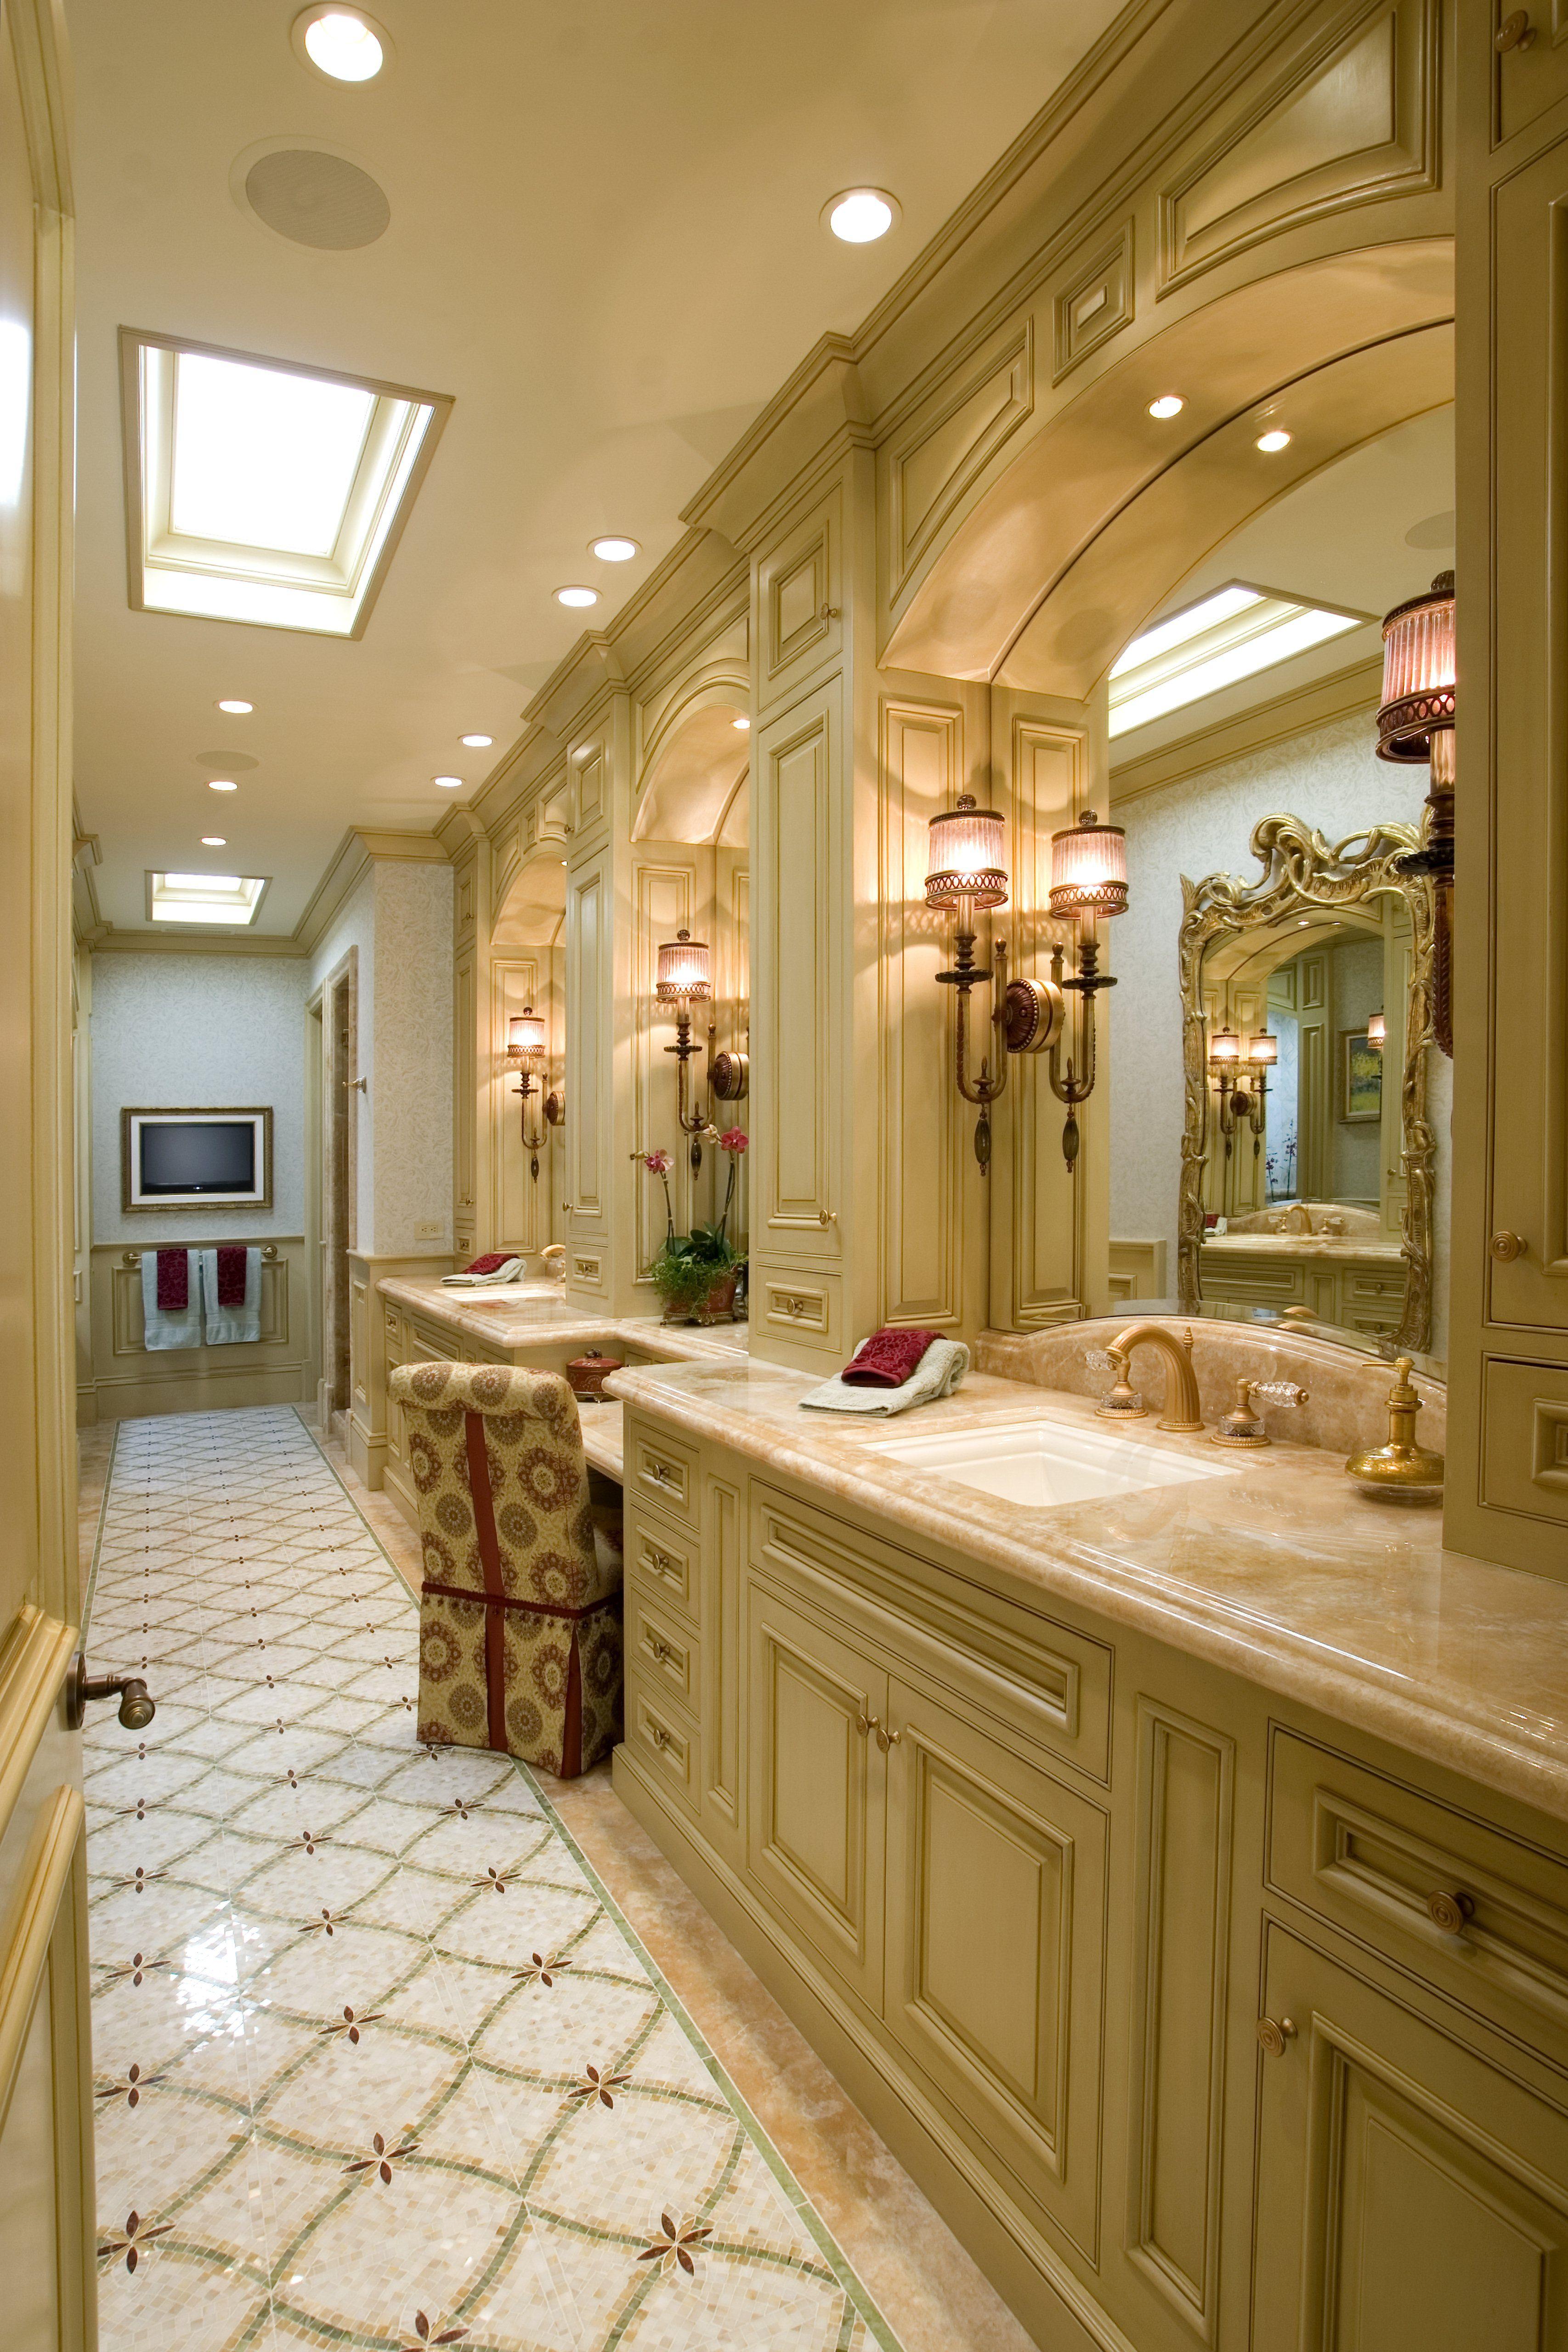 Wall Decor Ideas For Master Bathroom